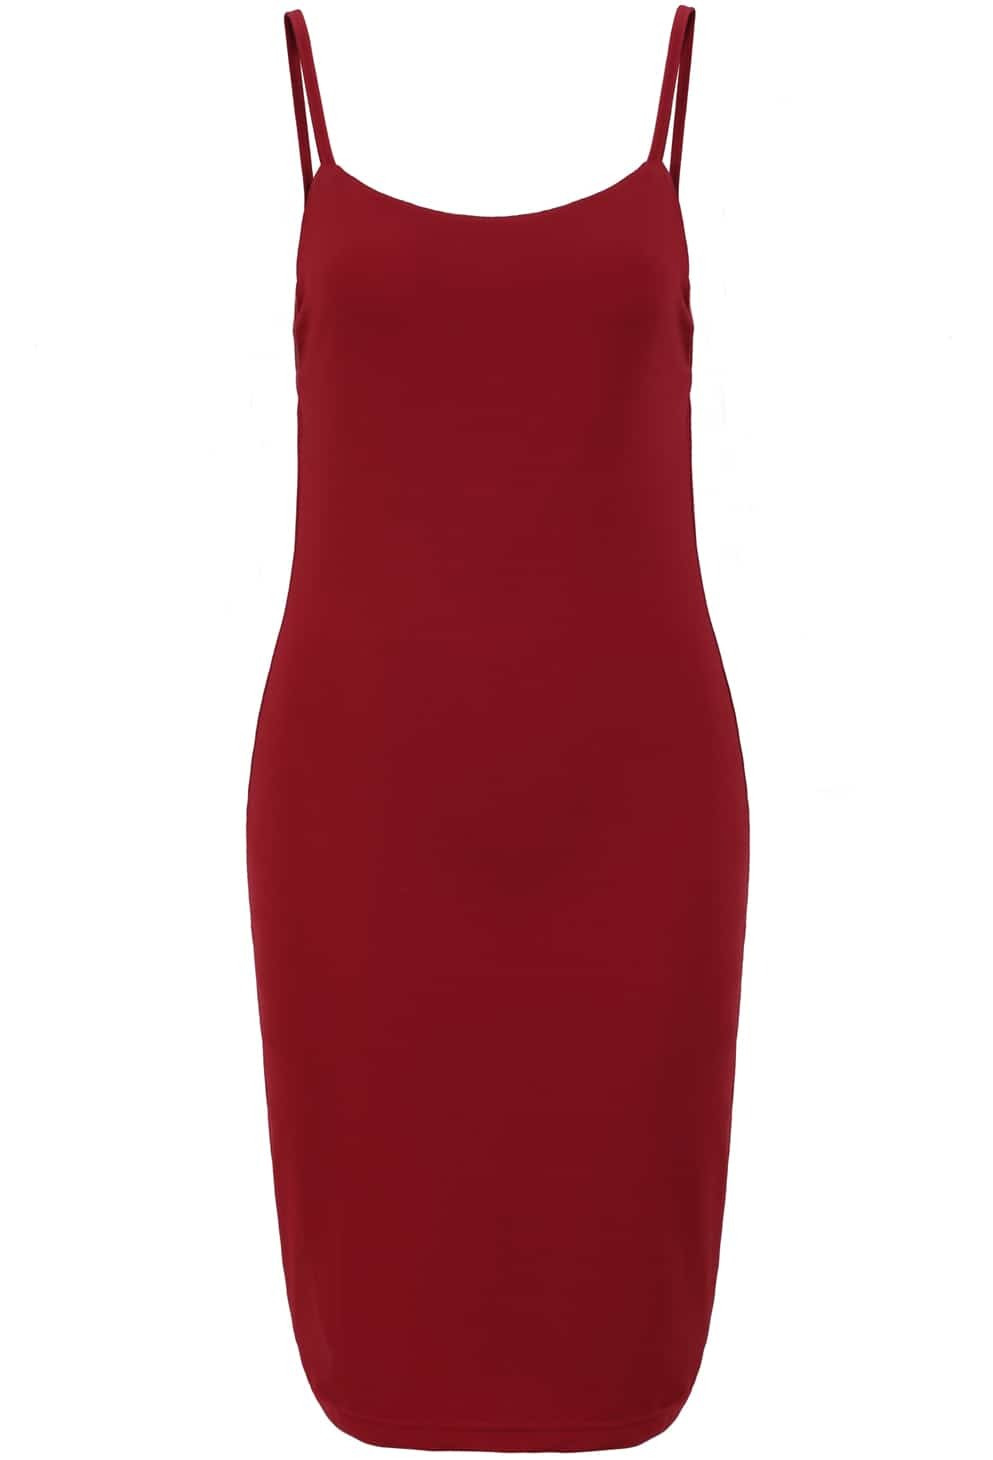 Juniors homecoming kalamazoo Spaghetti Strap Backless Plain Maxi Dress david jones maxx